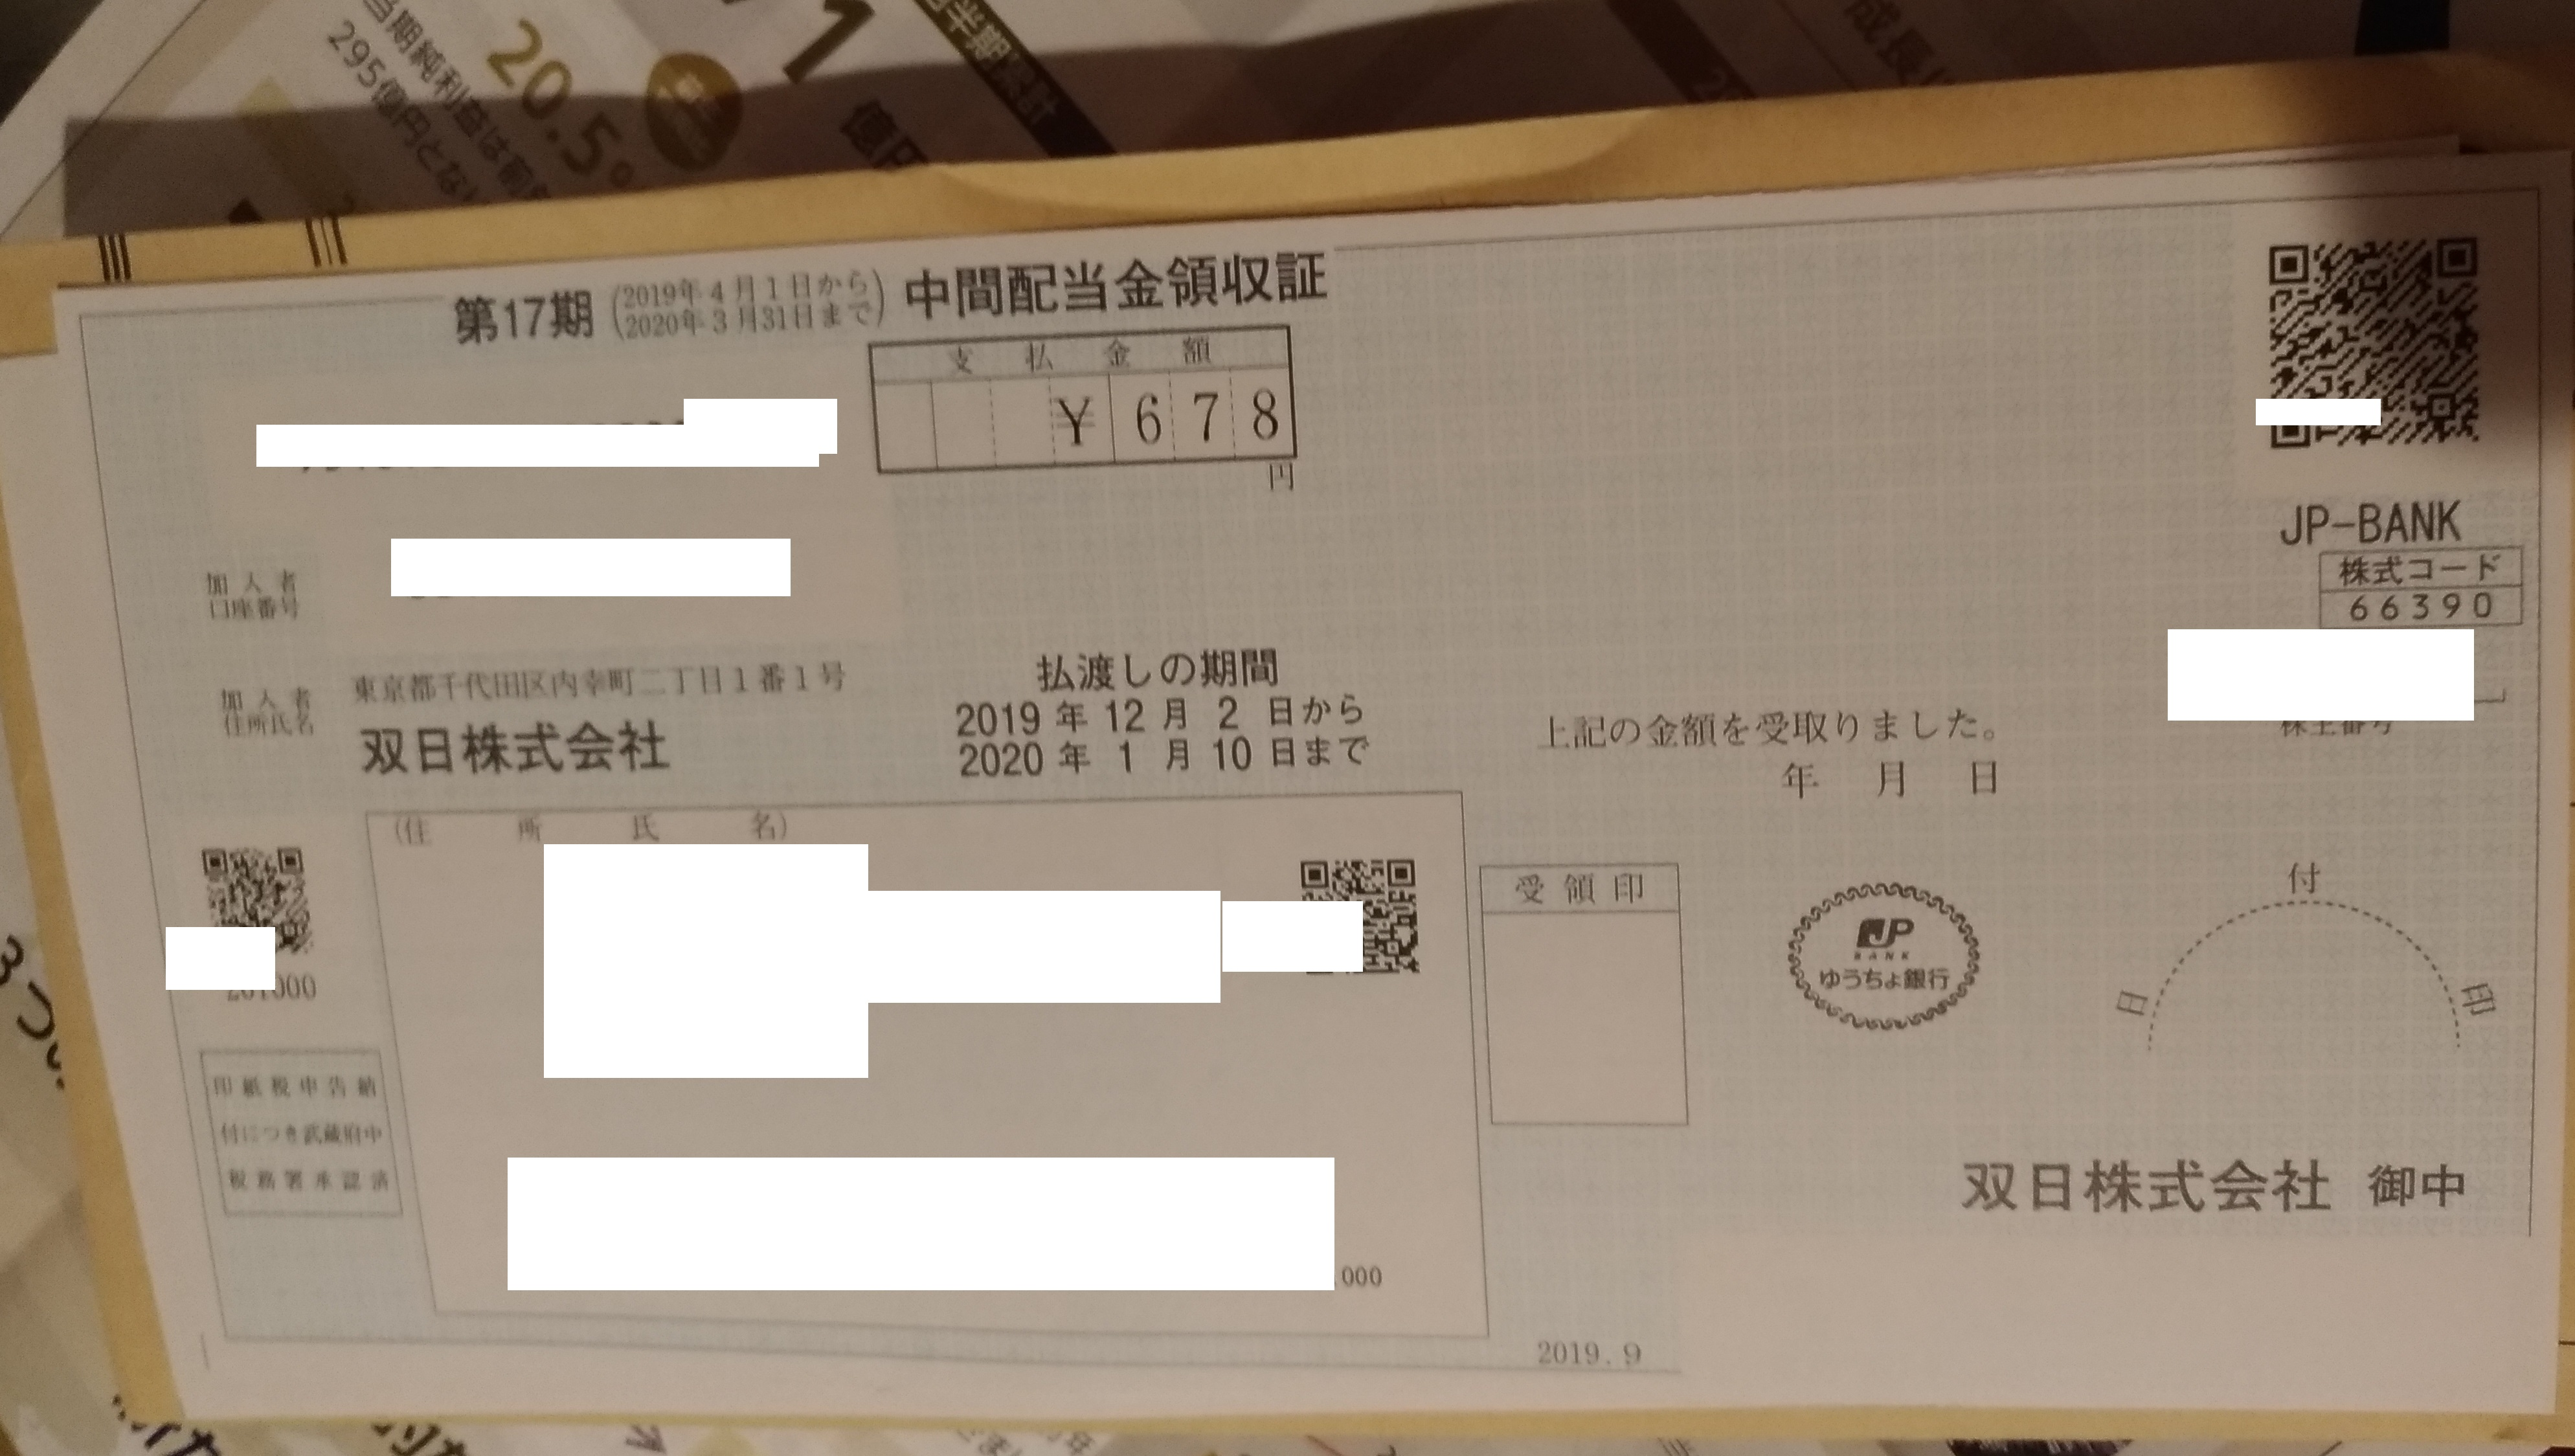 haito_sojitsu_201912.jpg